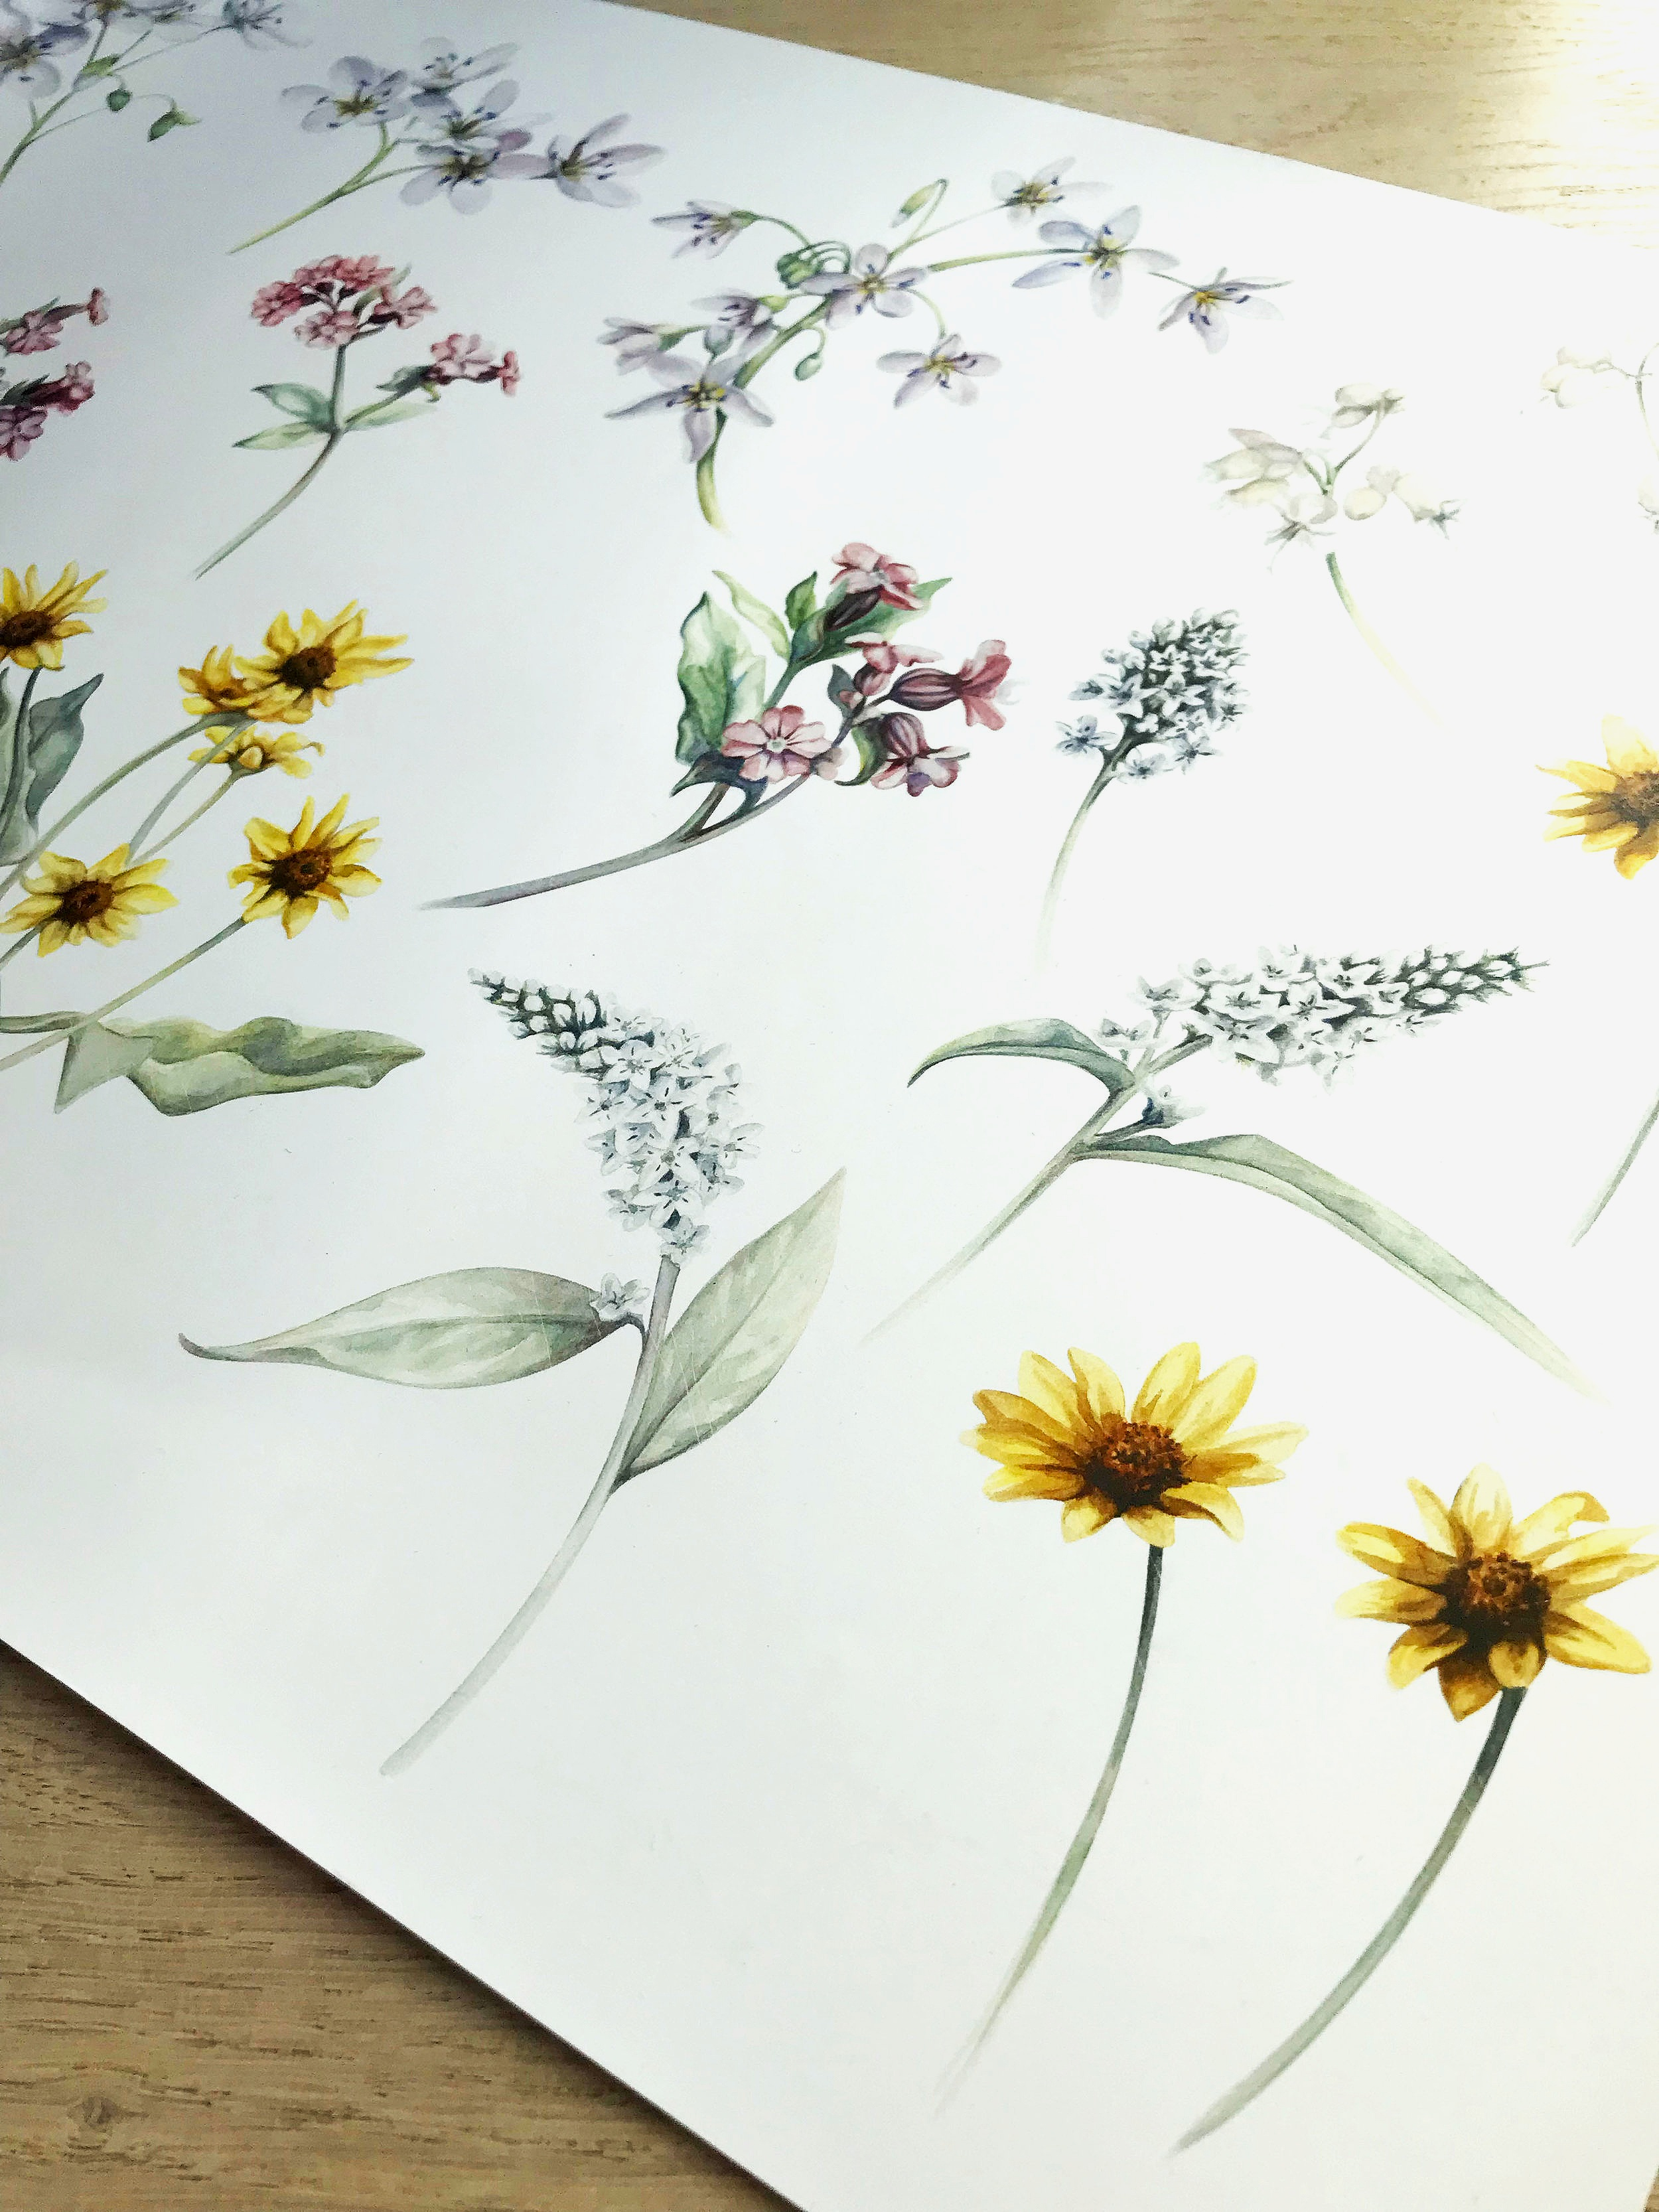 Original artwork for 'Primavera' for Liberty London Fabric AW19 'Aesthetic Renaissance'